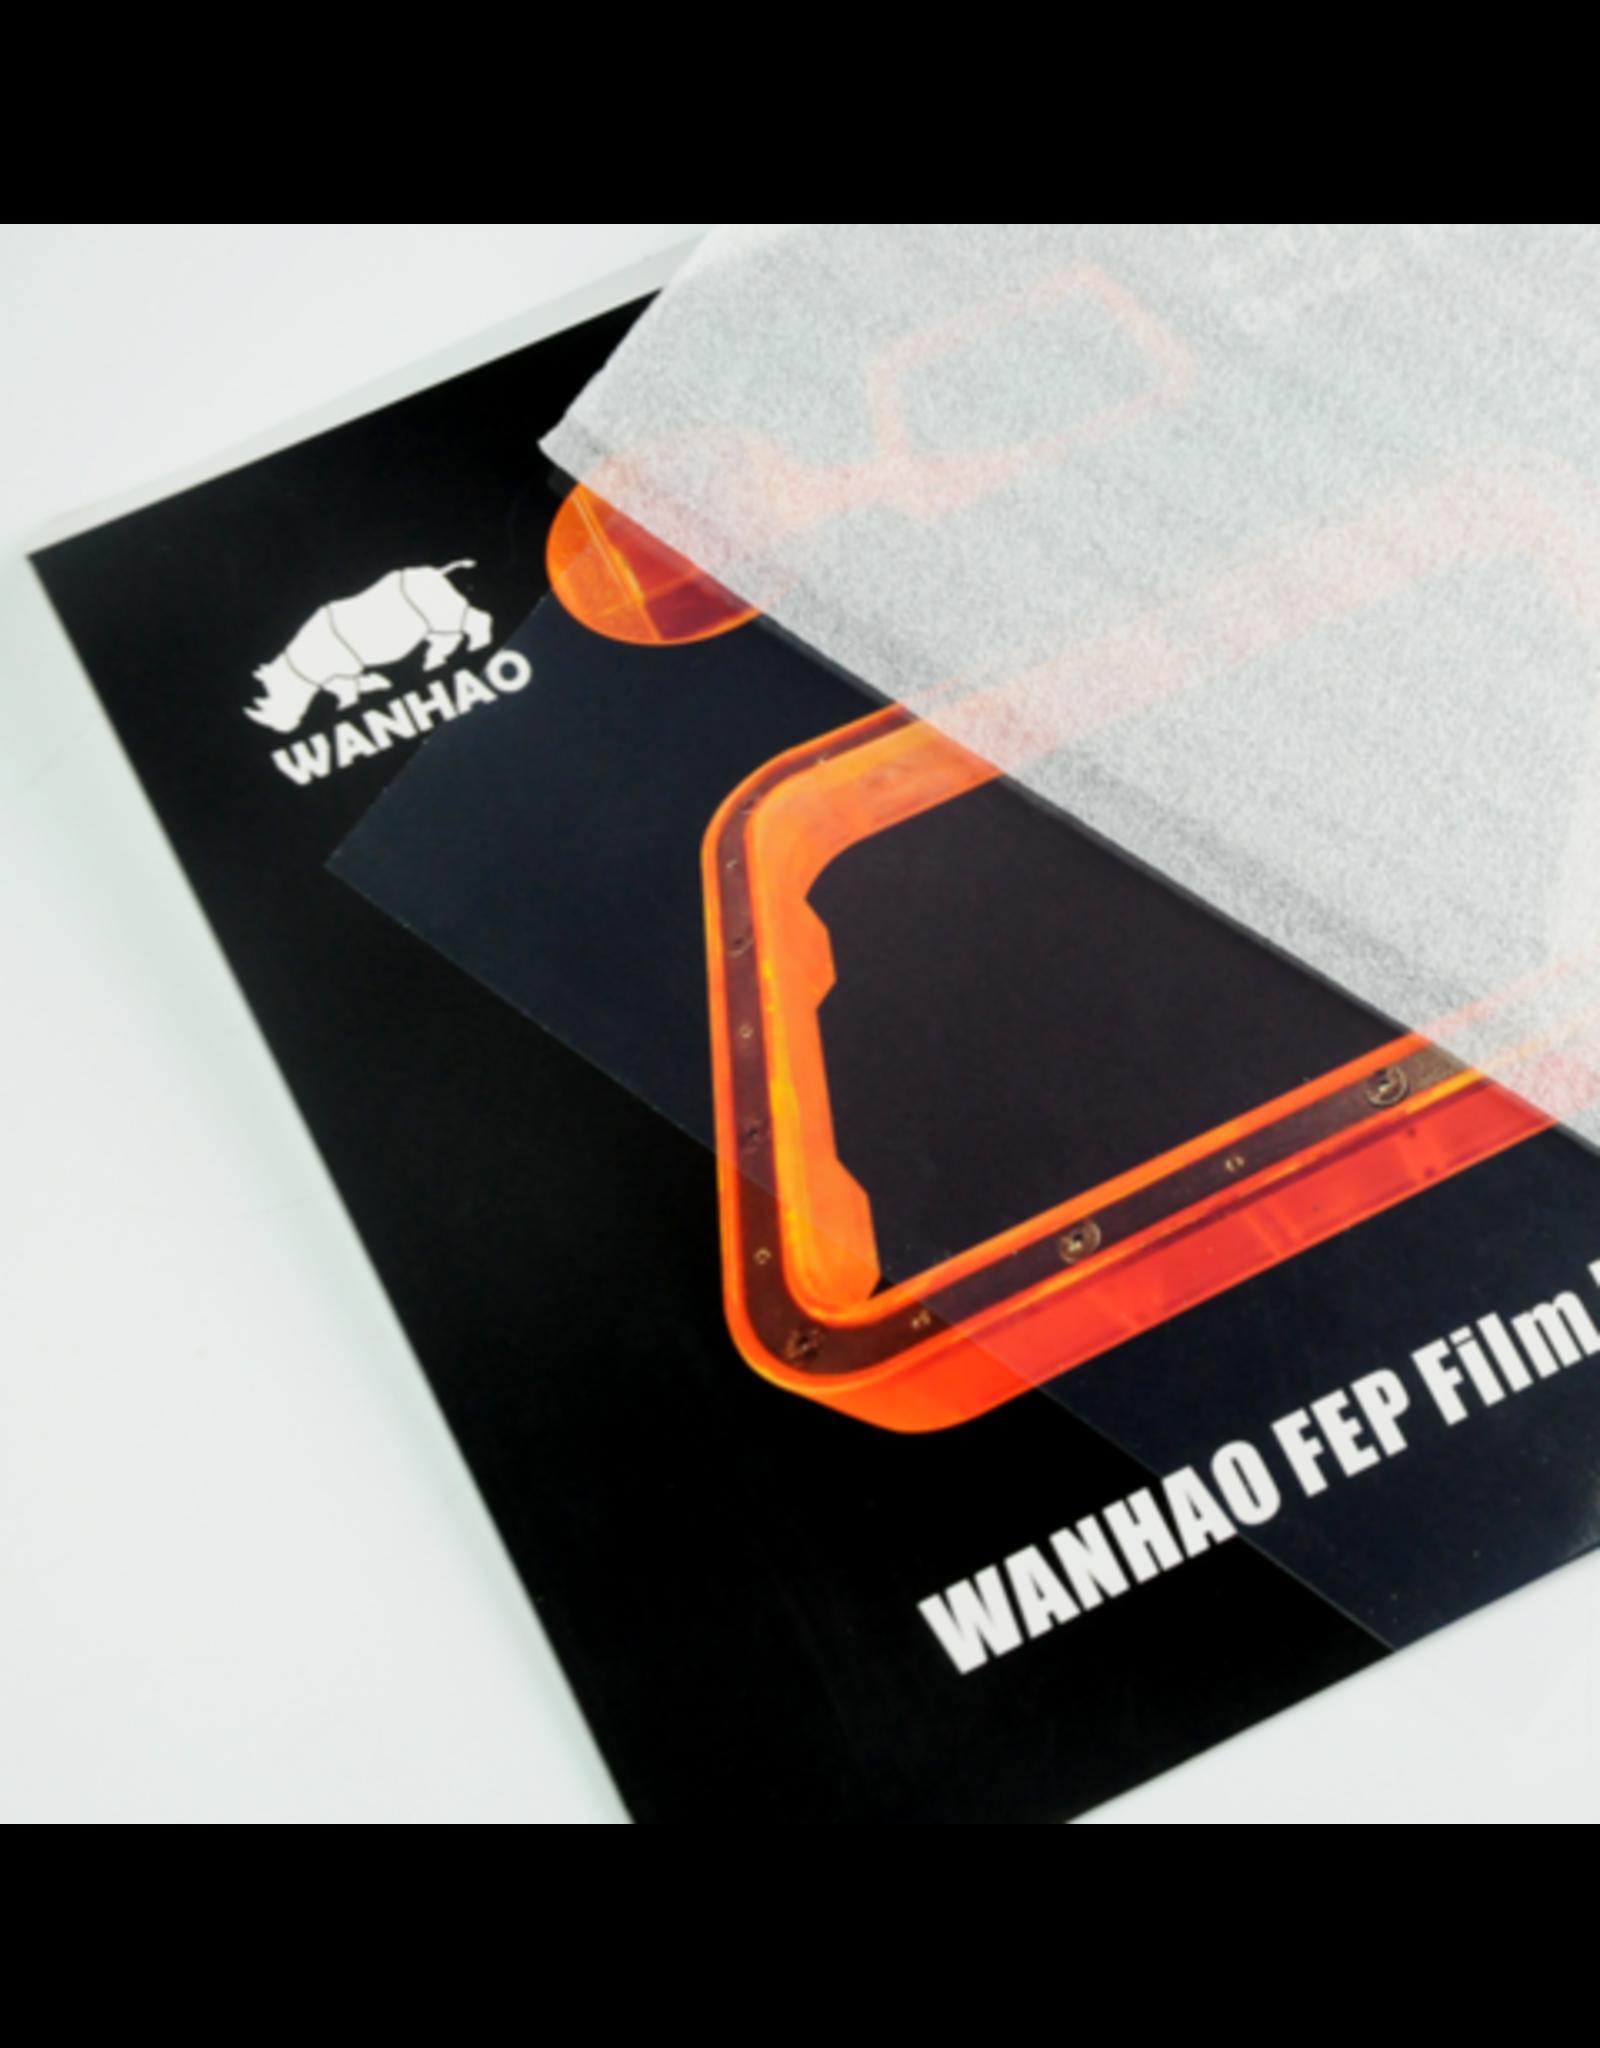 Wanhao Wanhao D8 - FEP Film 0.15mm*220mm*270mm